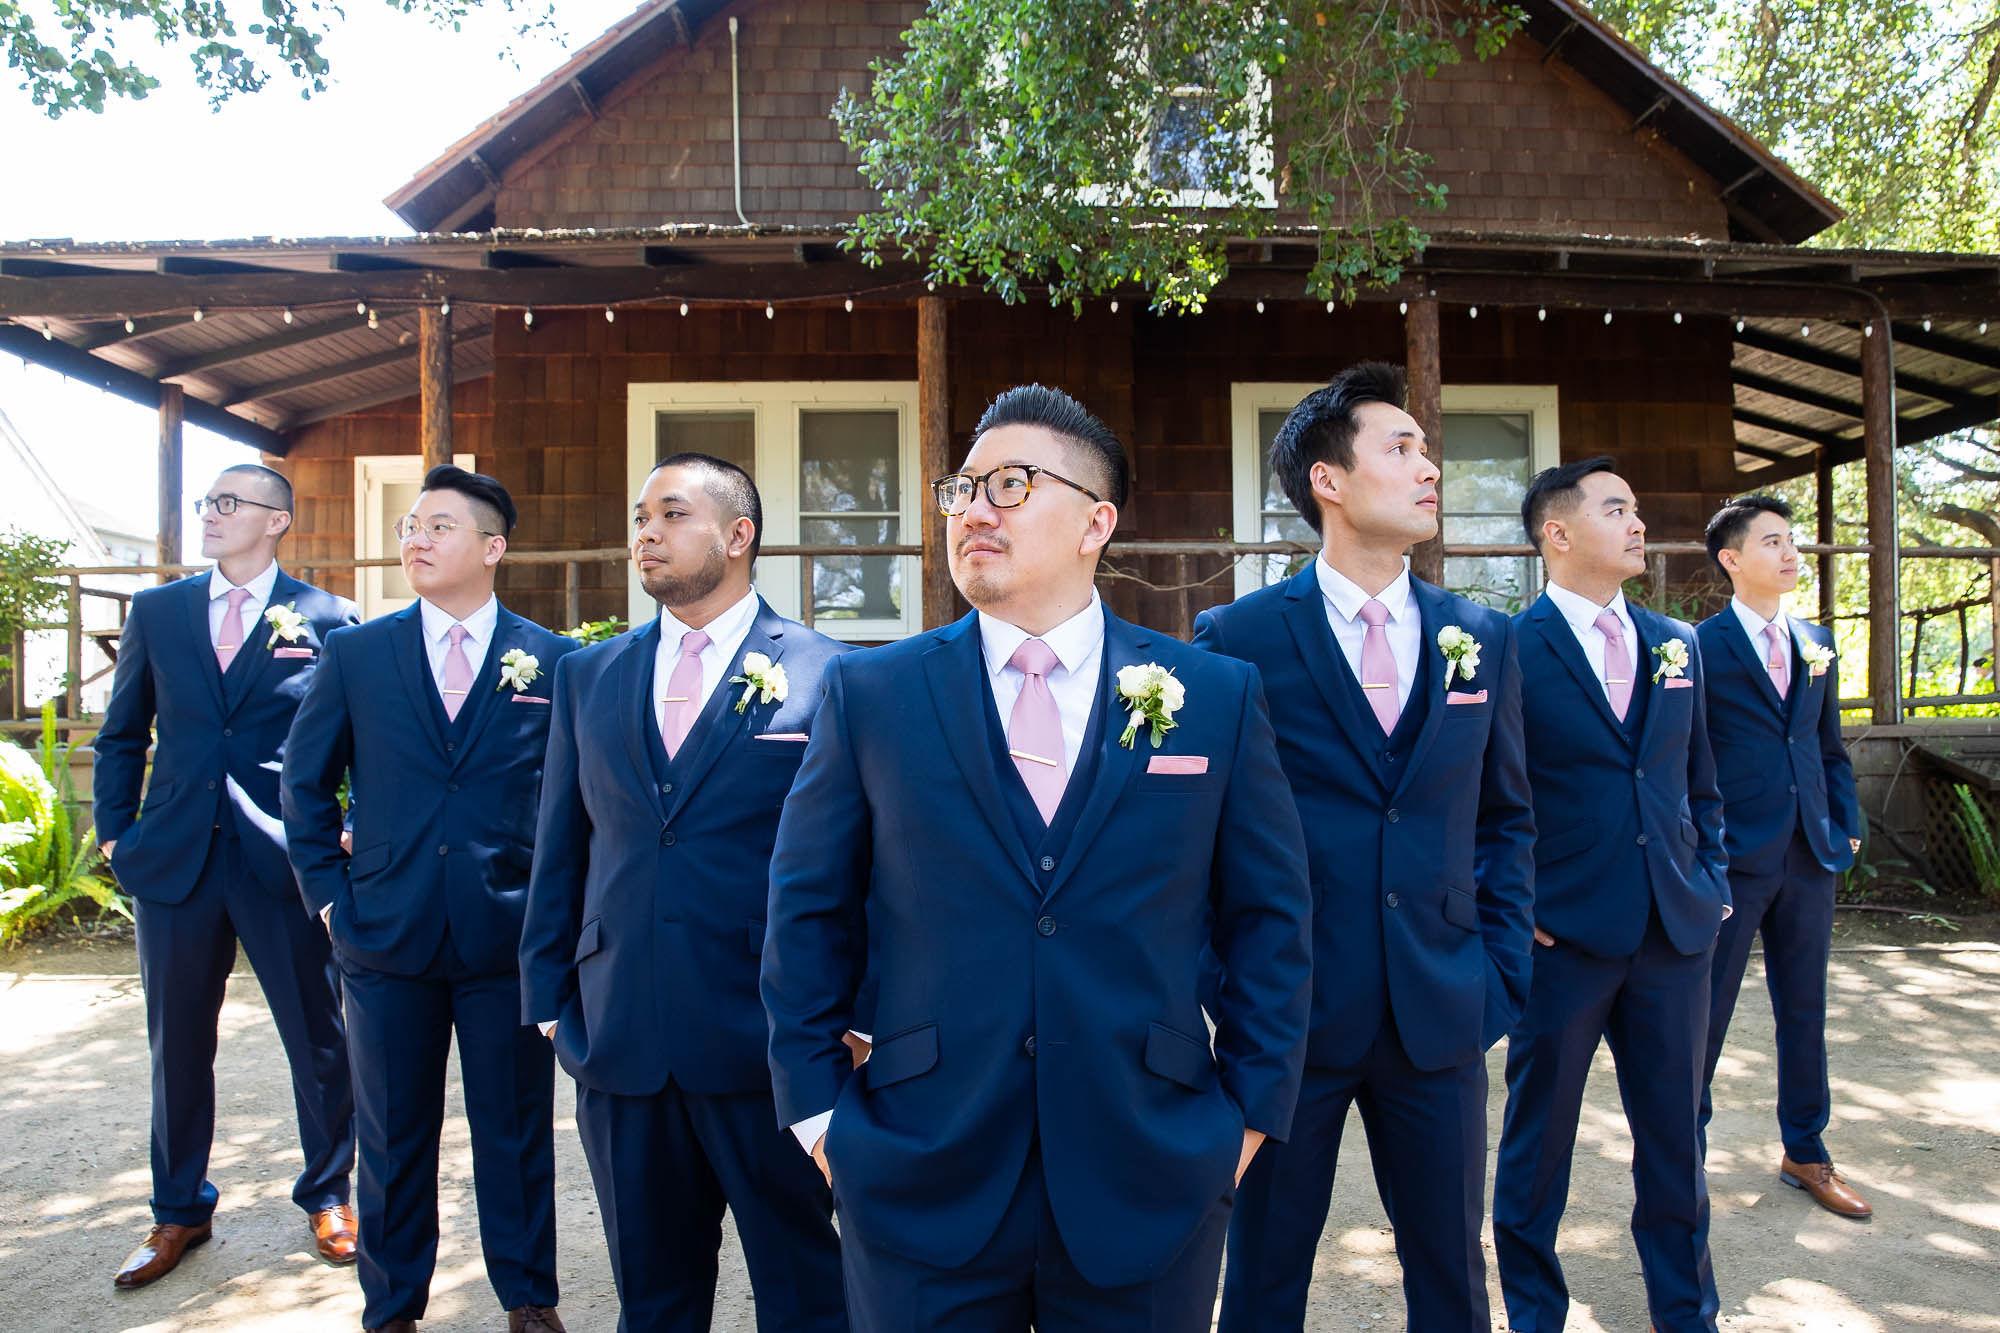 Resized-S&S-WeddingHighlights-10.jpg